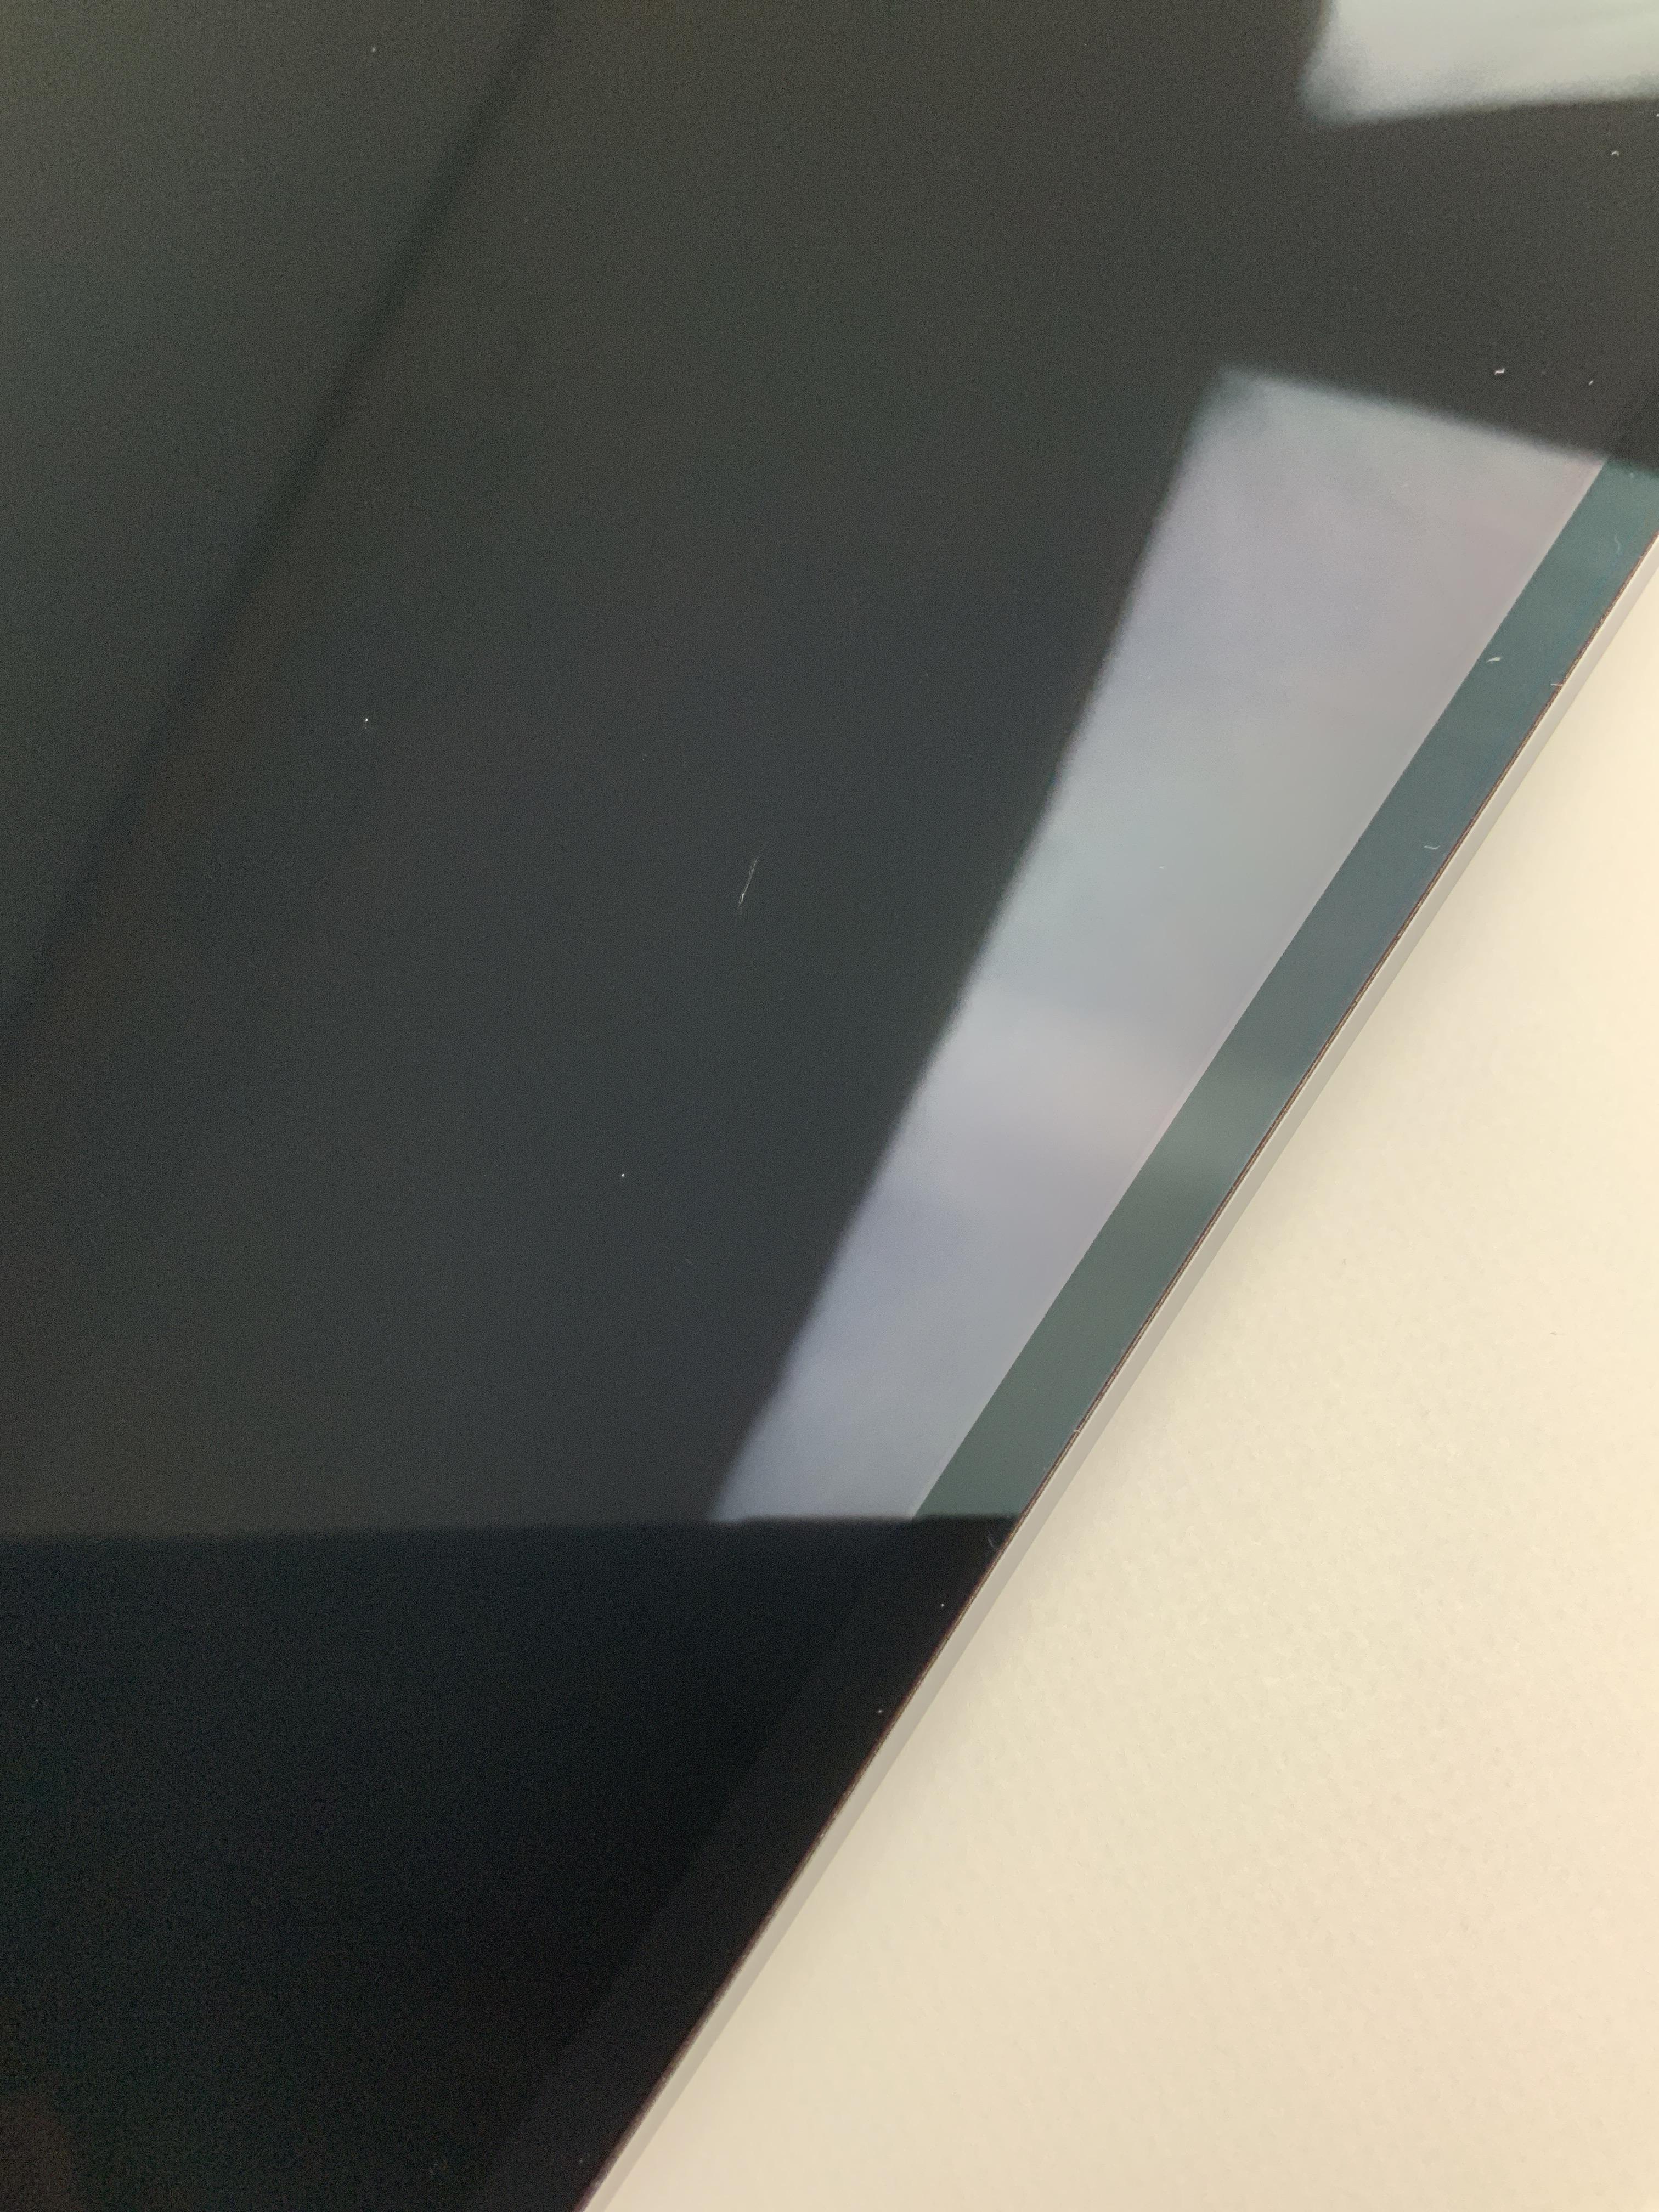 iPad Air 3 Wi-Fi + Cellular 256GB, 256GB, Space Gray, obraz 3